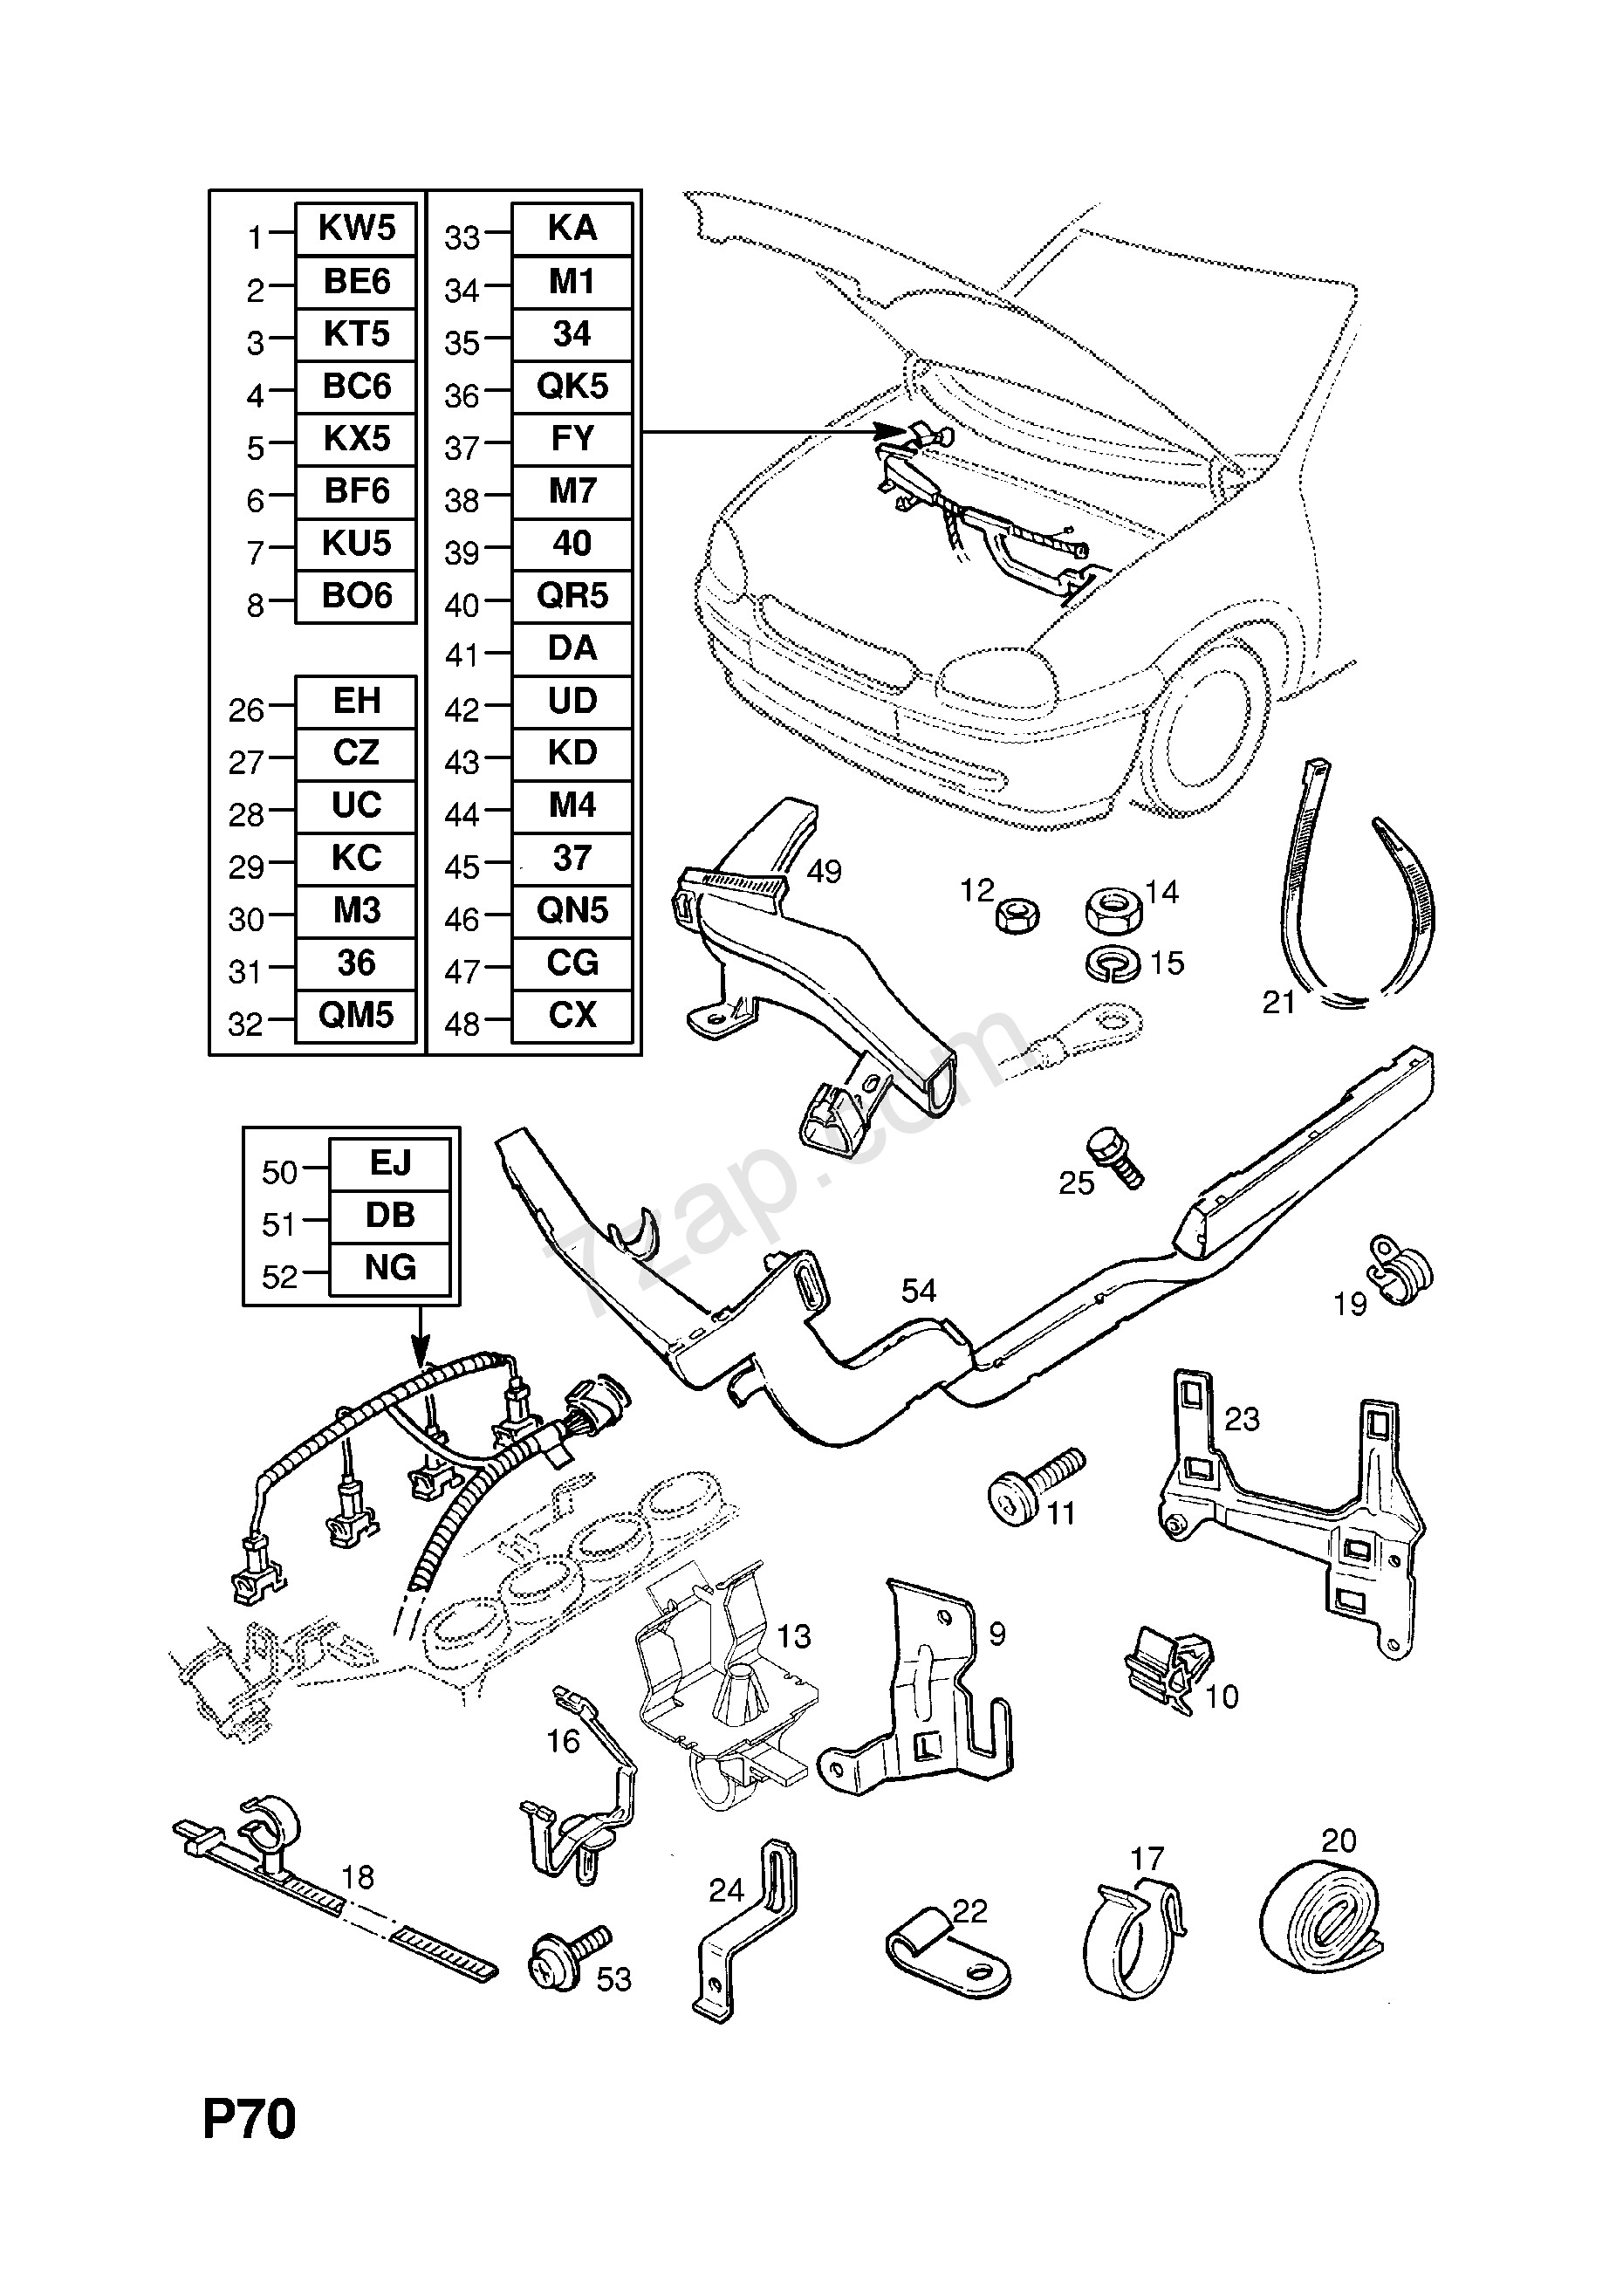 opel corsa engine diagram my wiring diagram rotax engine diagram [c16xe[l91] x16xe[l91] petrol engines] opel corsa b tigra a